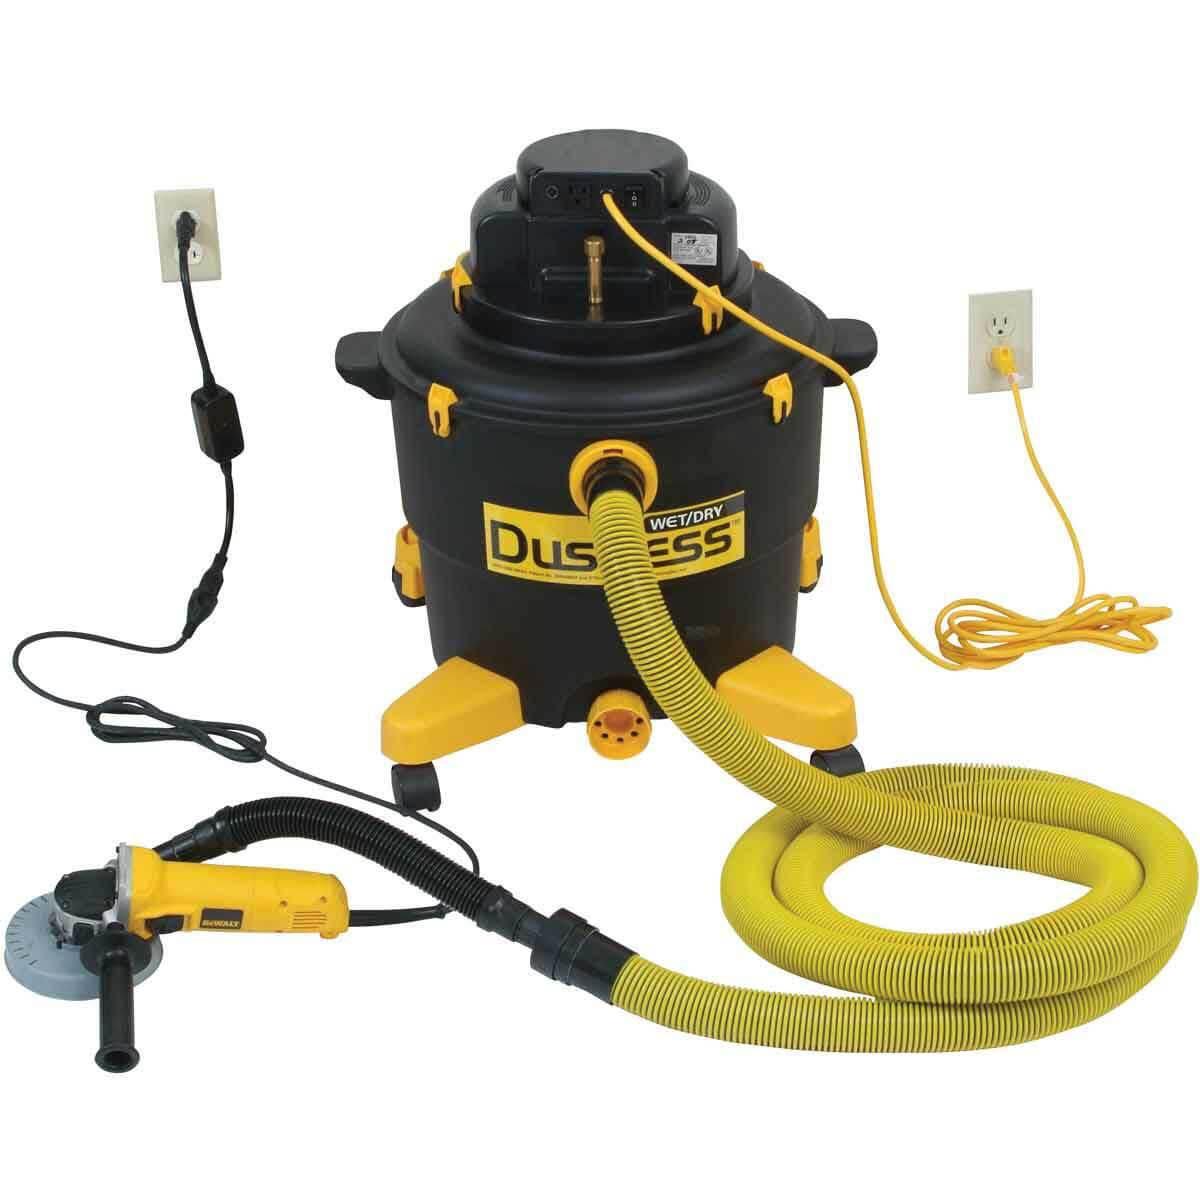 TeqVac Dustless Wet Dry Vacuum 162251